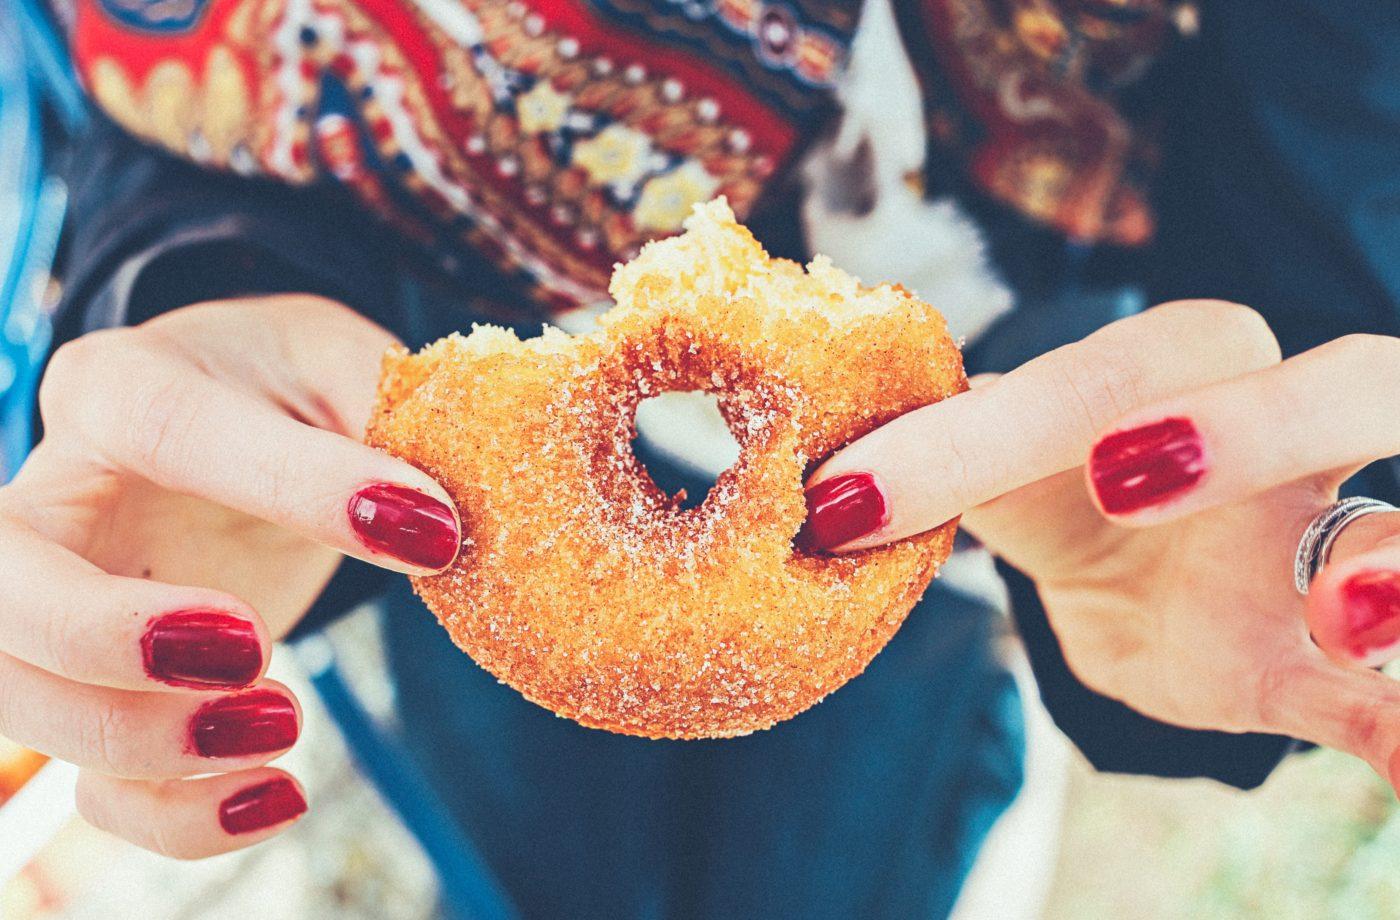 Heißhunger auf Süßes? Hilfe durch E. coli Bakterien